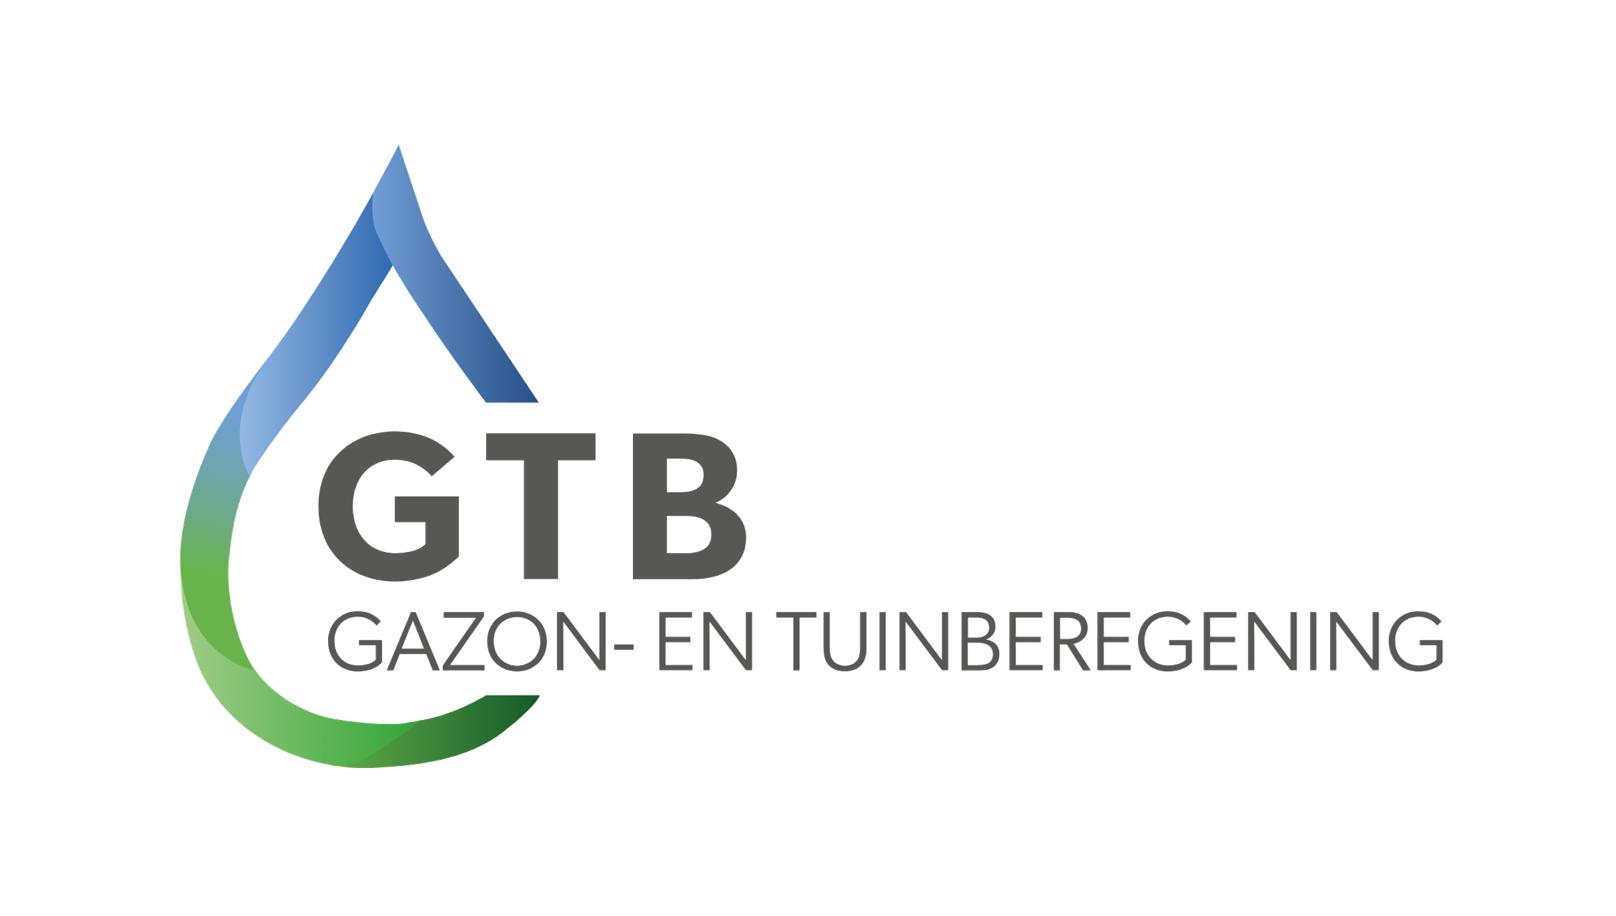 GTB Gazon- en tuinberegening